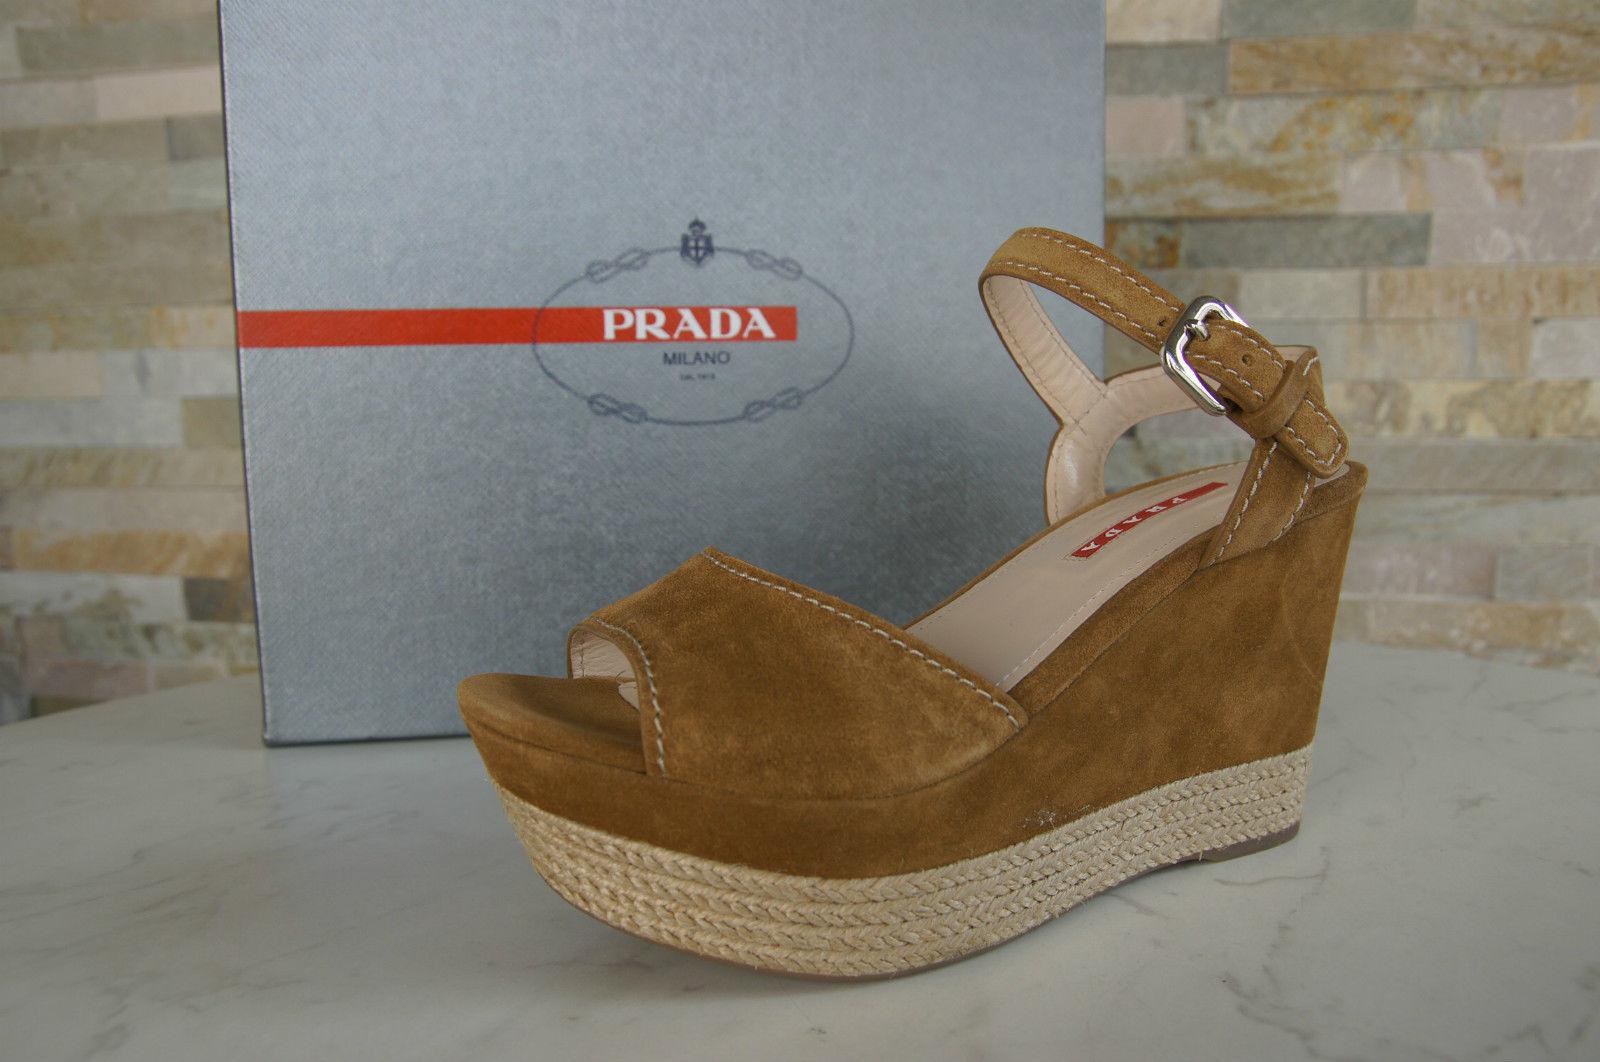 Prada Prada Prada talla 38,5 plataforma sandalias zapatos sisal caramelo nuevo ex. PVP  orden en línea